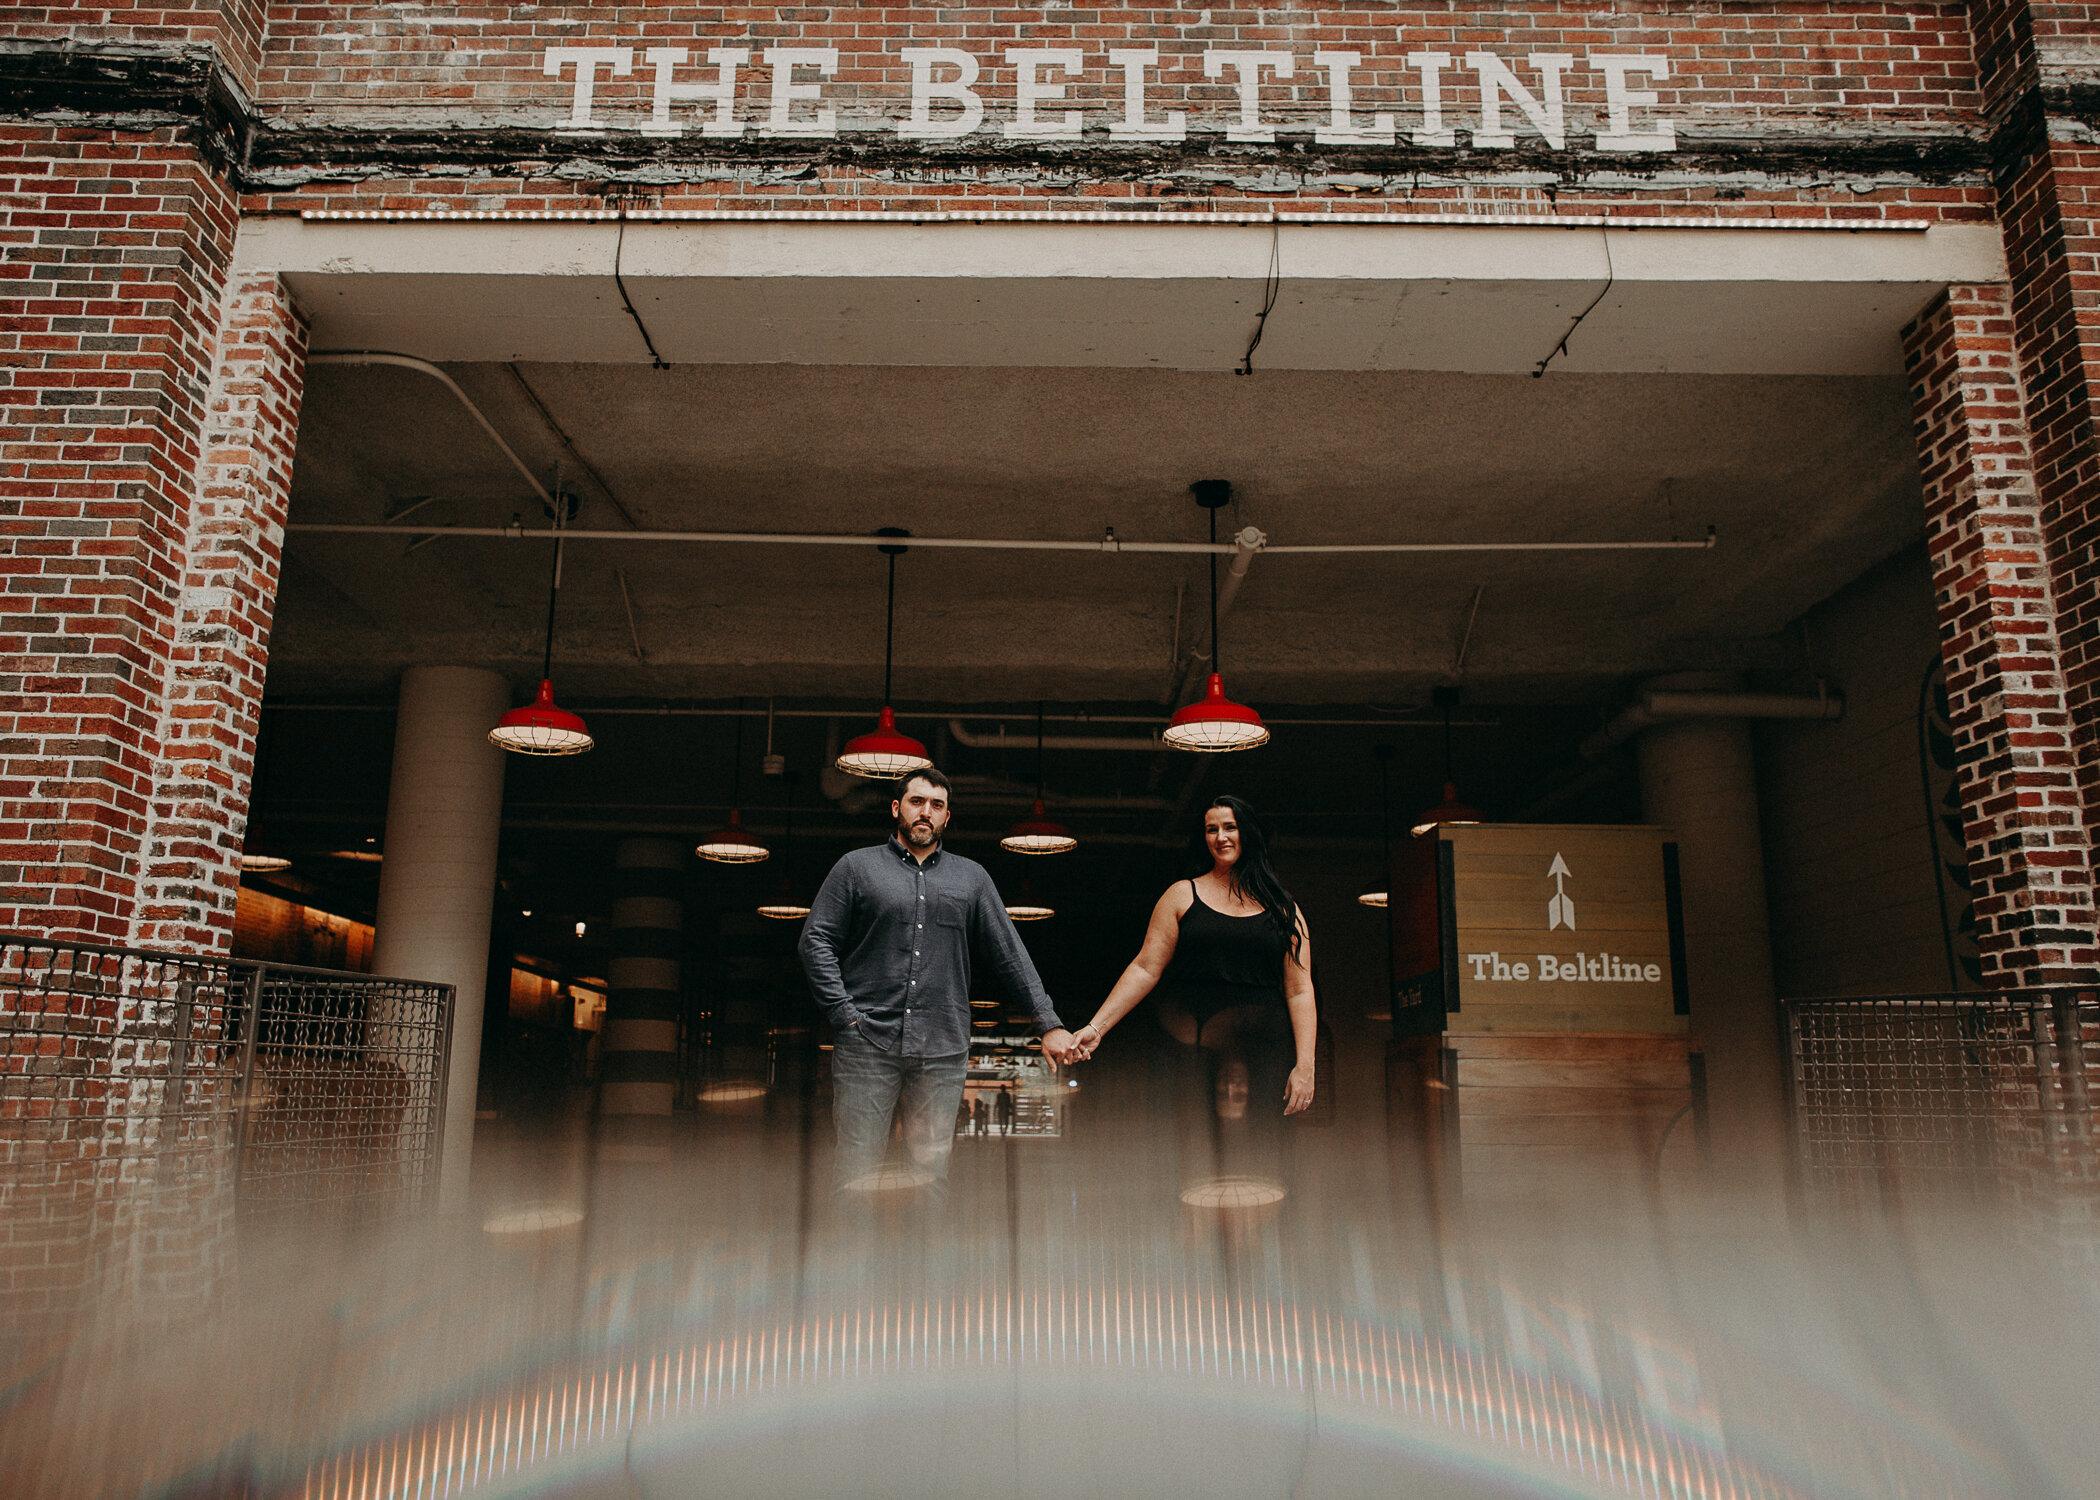 Aline_Marin_Photography_Ponce_City_Market_Atlanta_Ga_Engagement_Session_Ideas-19.jpg